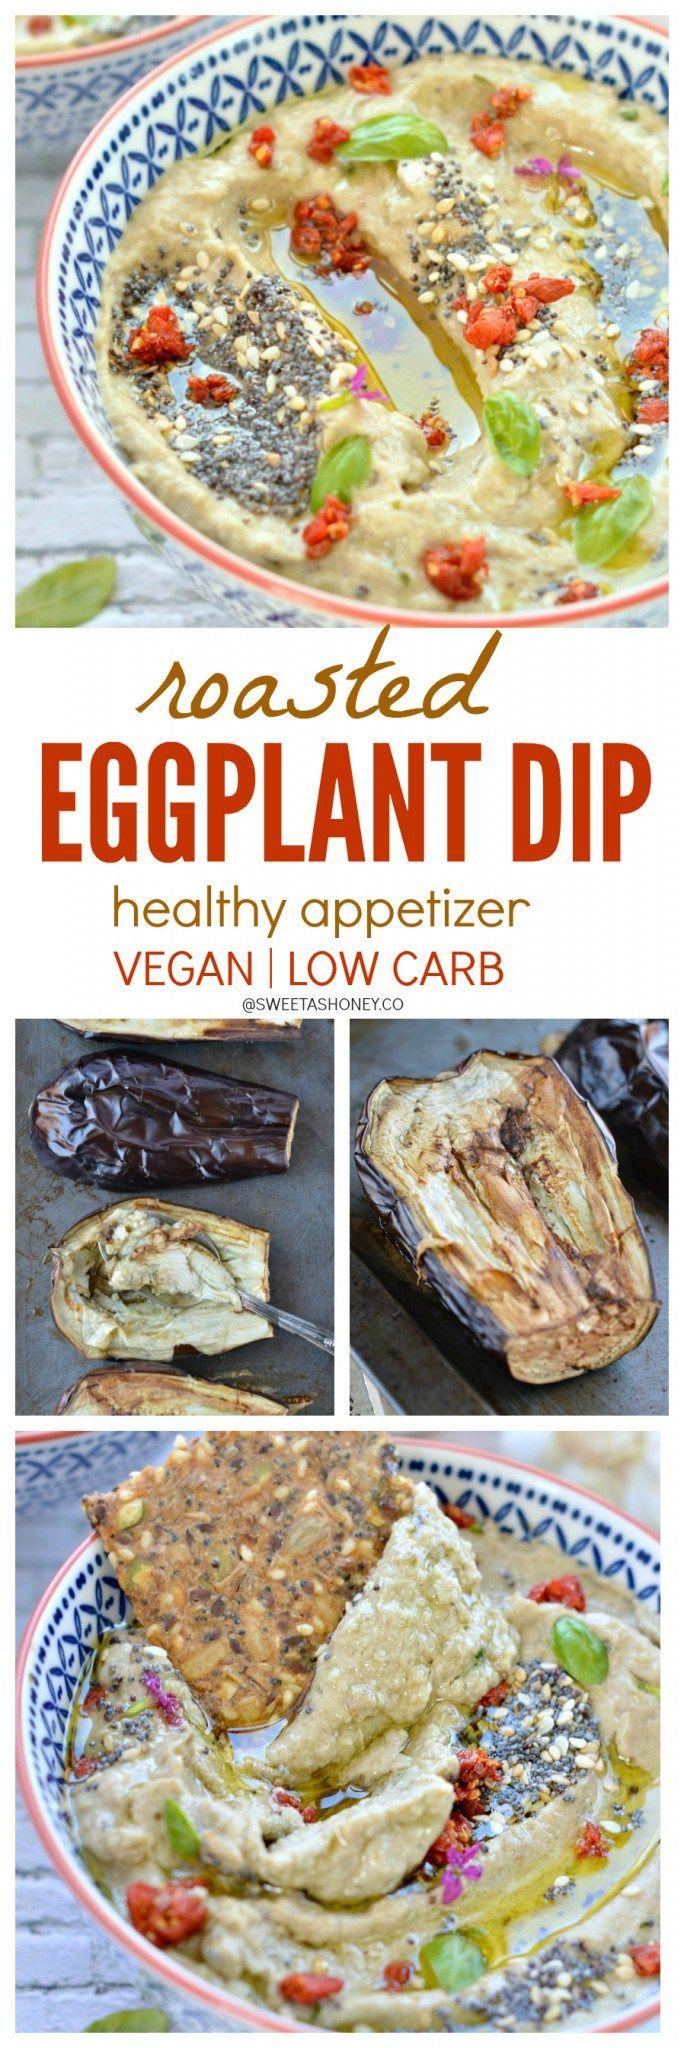 roasted eggplant dip vegan low carb